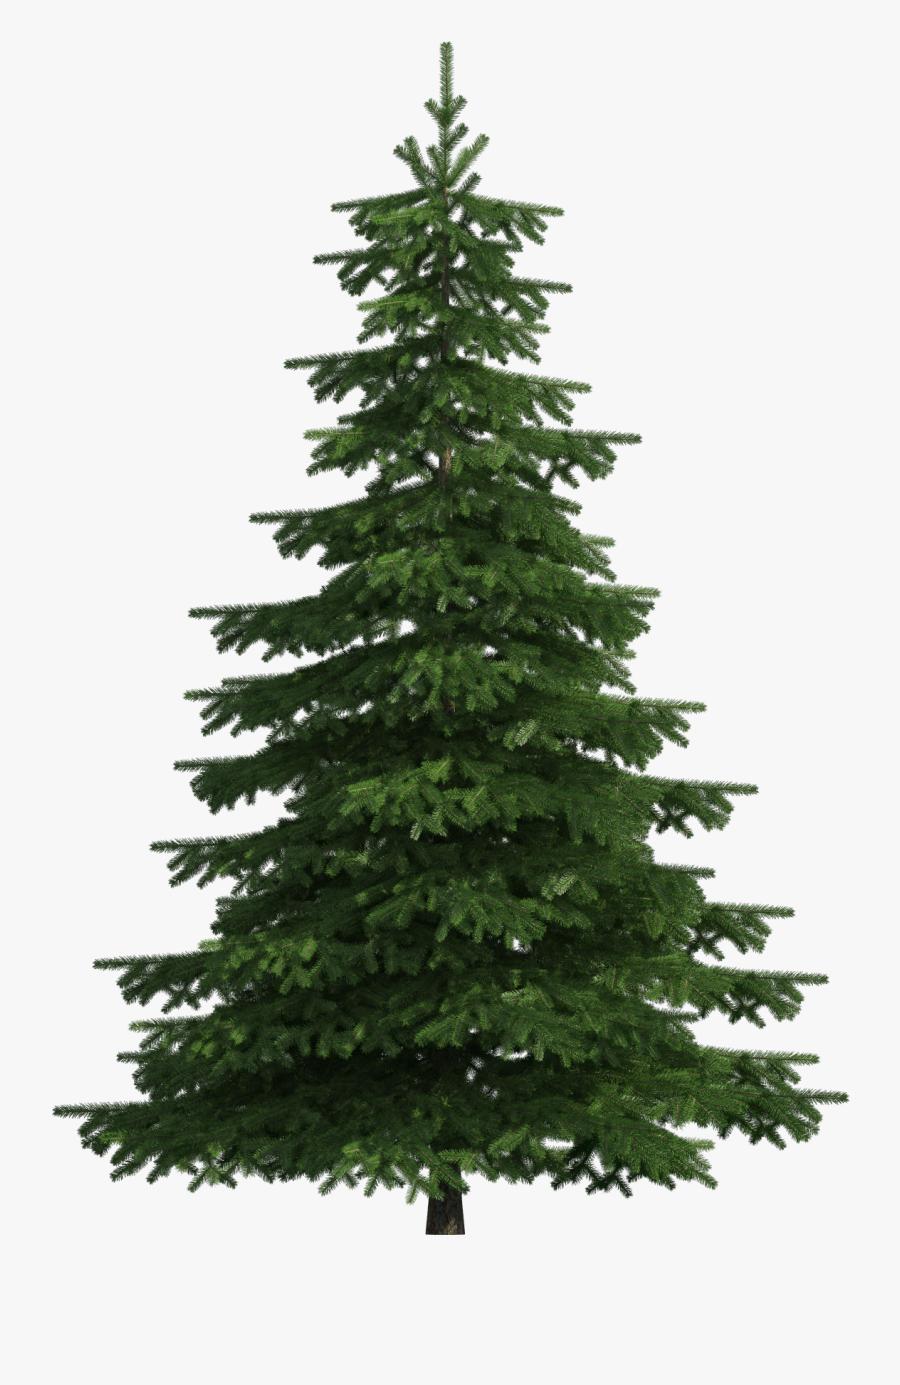 Realistic Pine Tree Png Clip Art - Transparent Pine Tree Png, Transparent Clipart